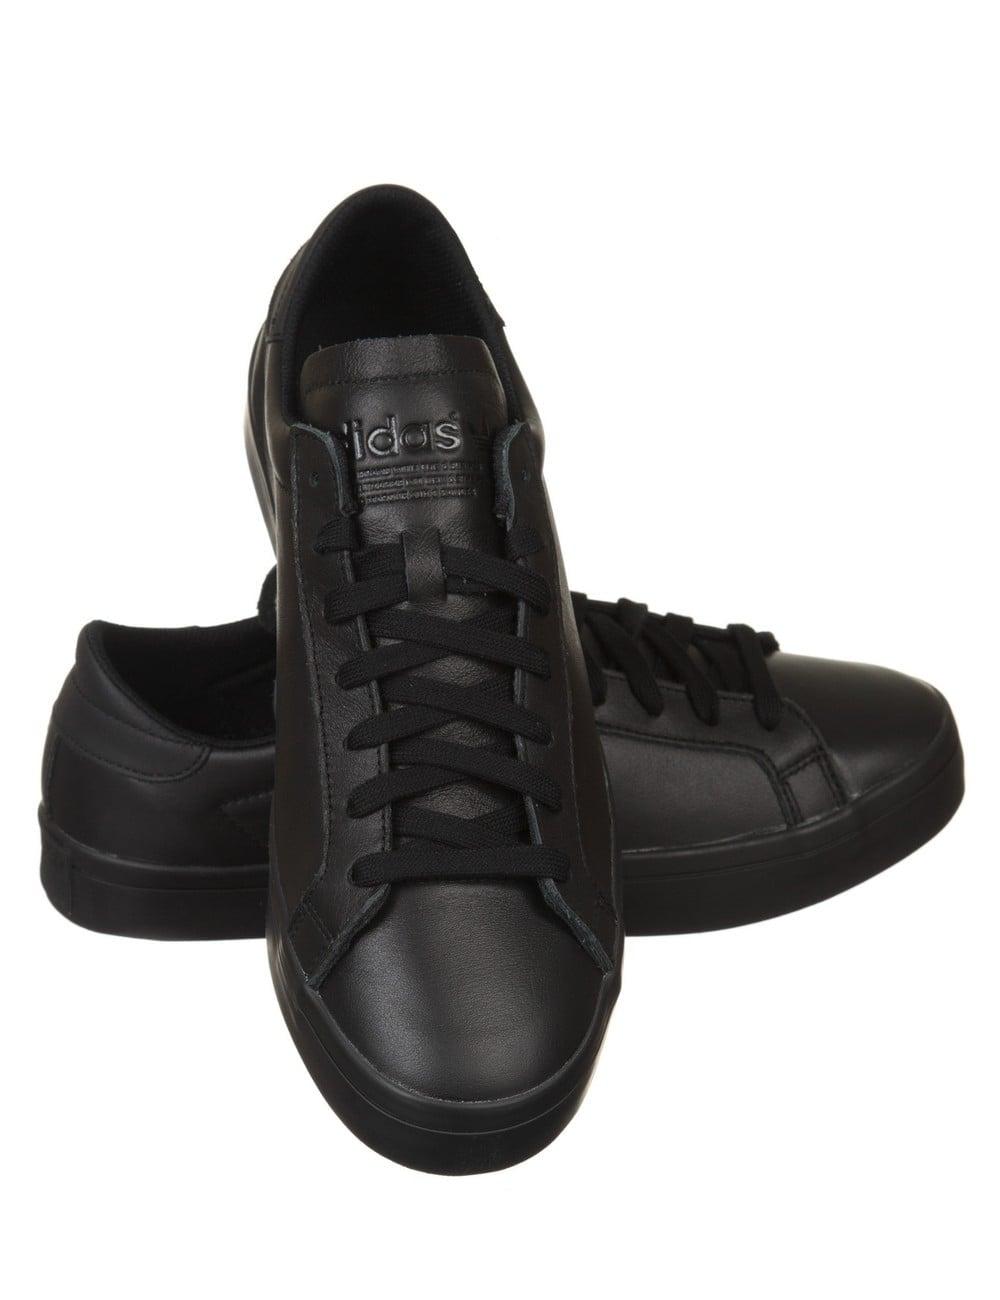 adidas mens dress shoes - 61% remise - www.muminlerotomotiv.com.tr